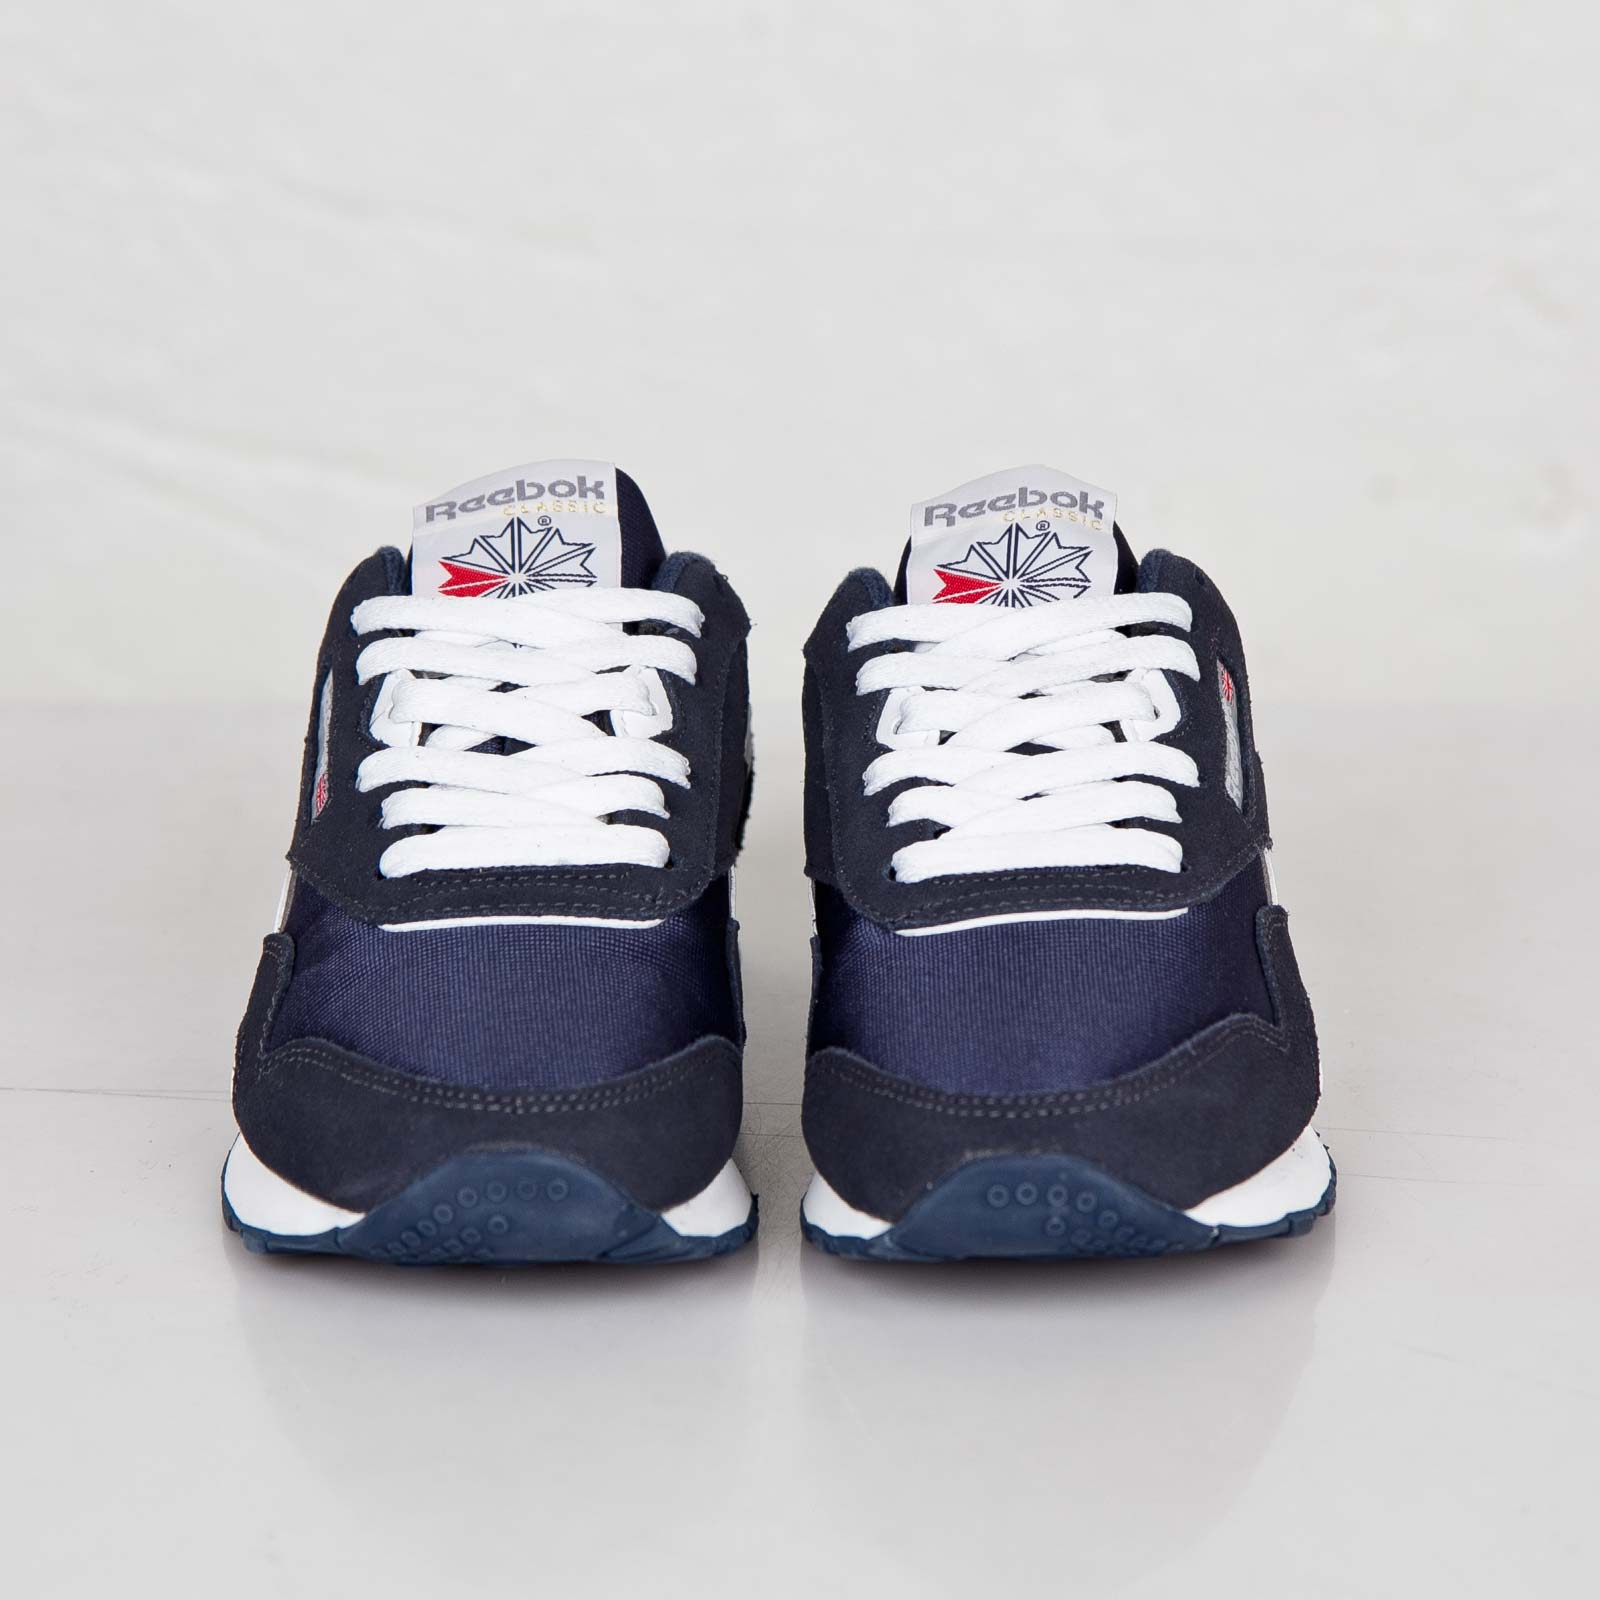 57b6a05cee1 Reebok Classic Nylon - 39750 - Sneakersnstuff